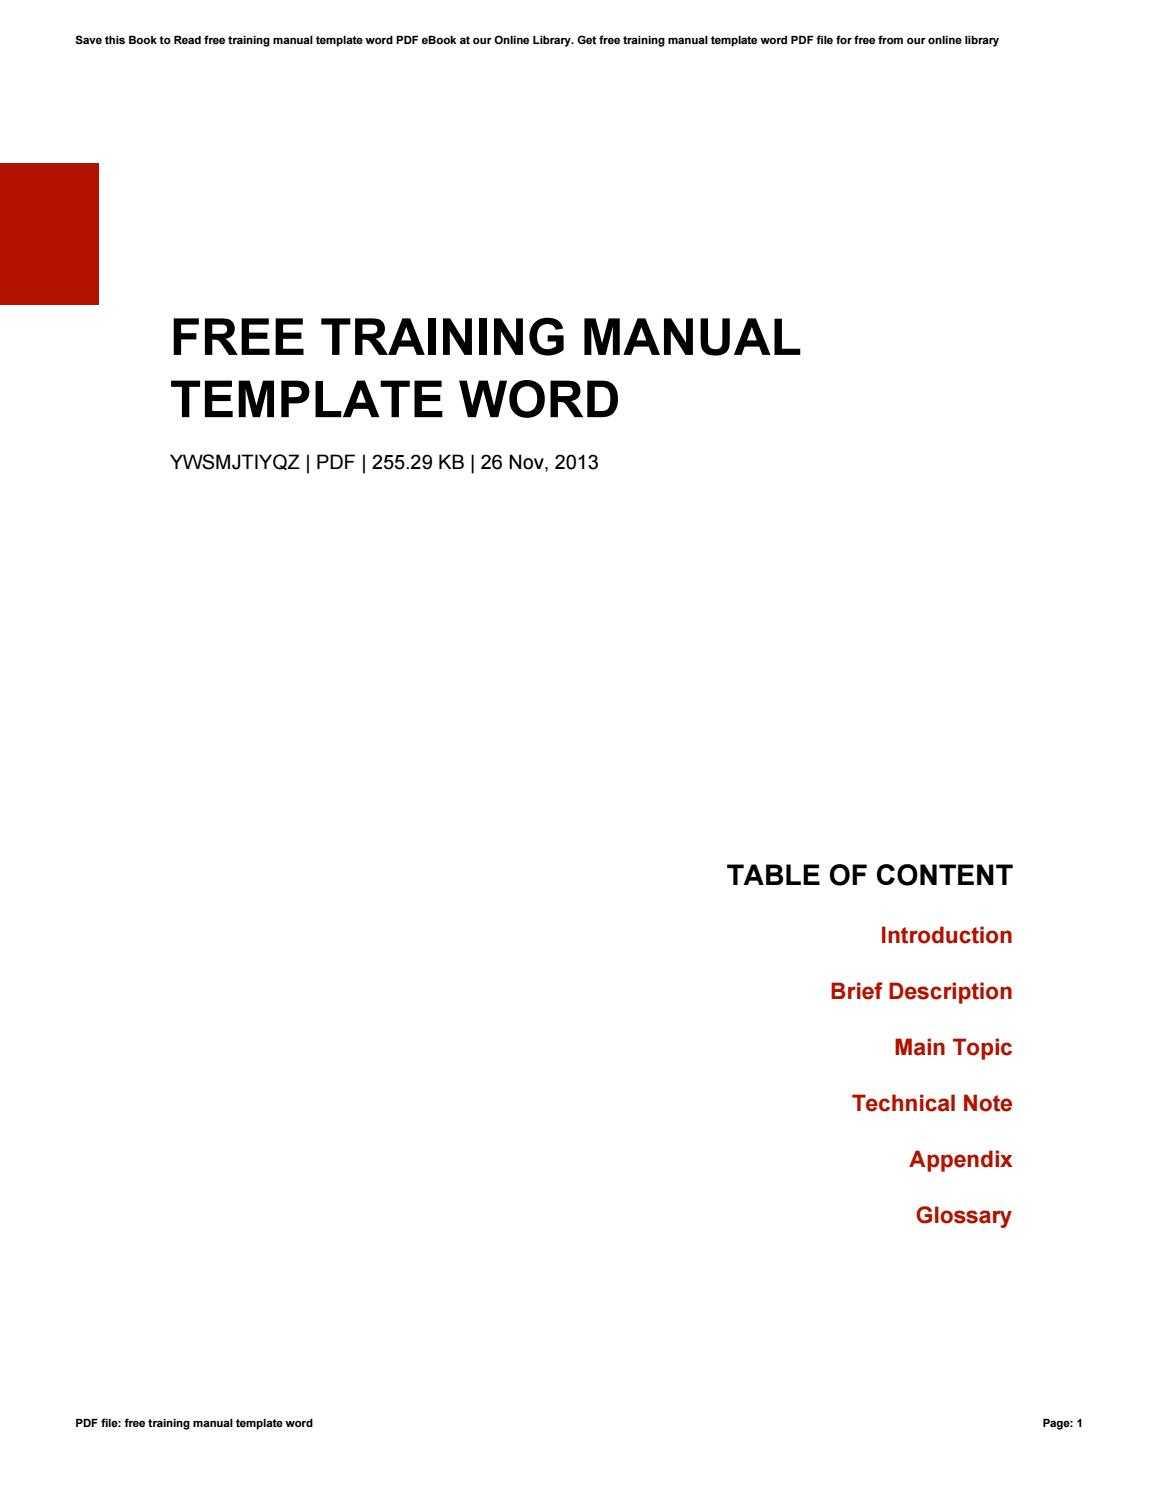 Free Training Manual Template Wordkazelink257 - Issuu Inside Training Documentation Template Word